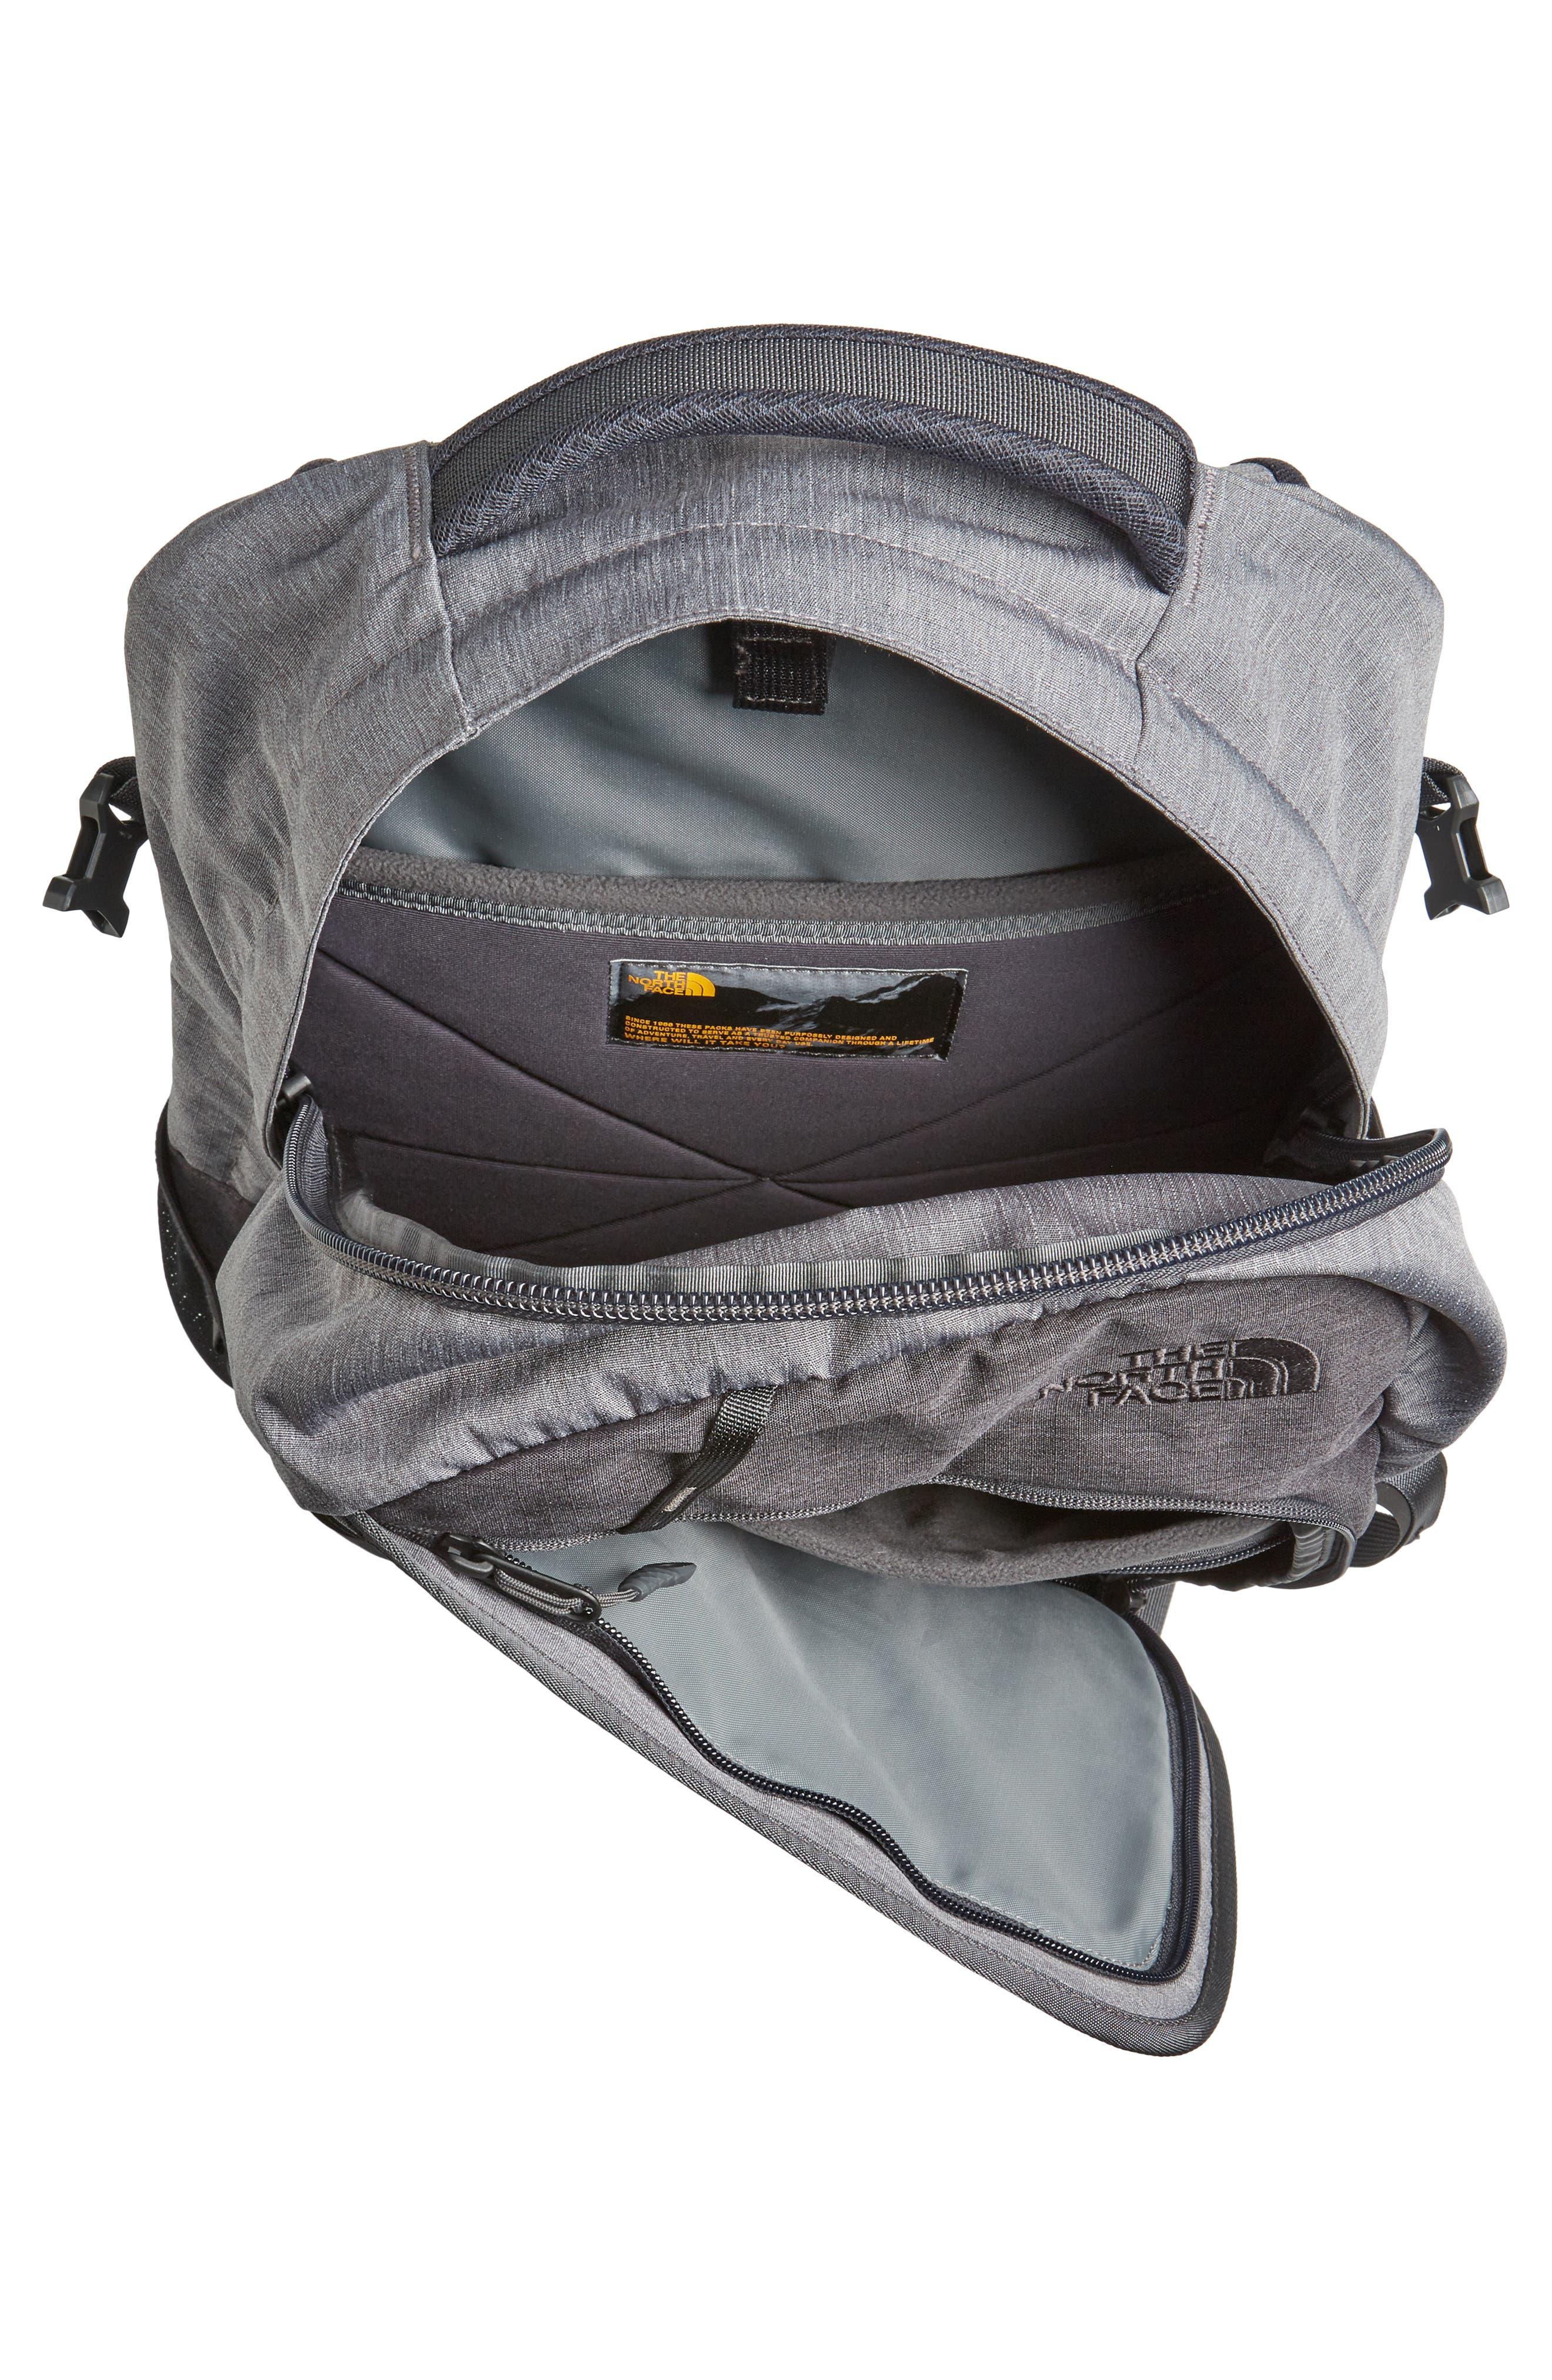 Hot Shot Backpack,                             Alternate thumbnail 4, color,                             021